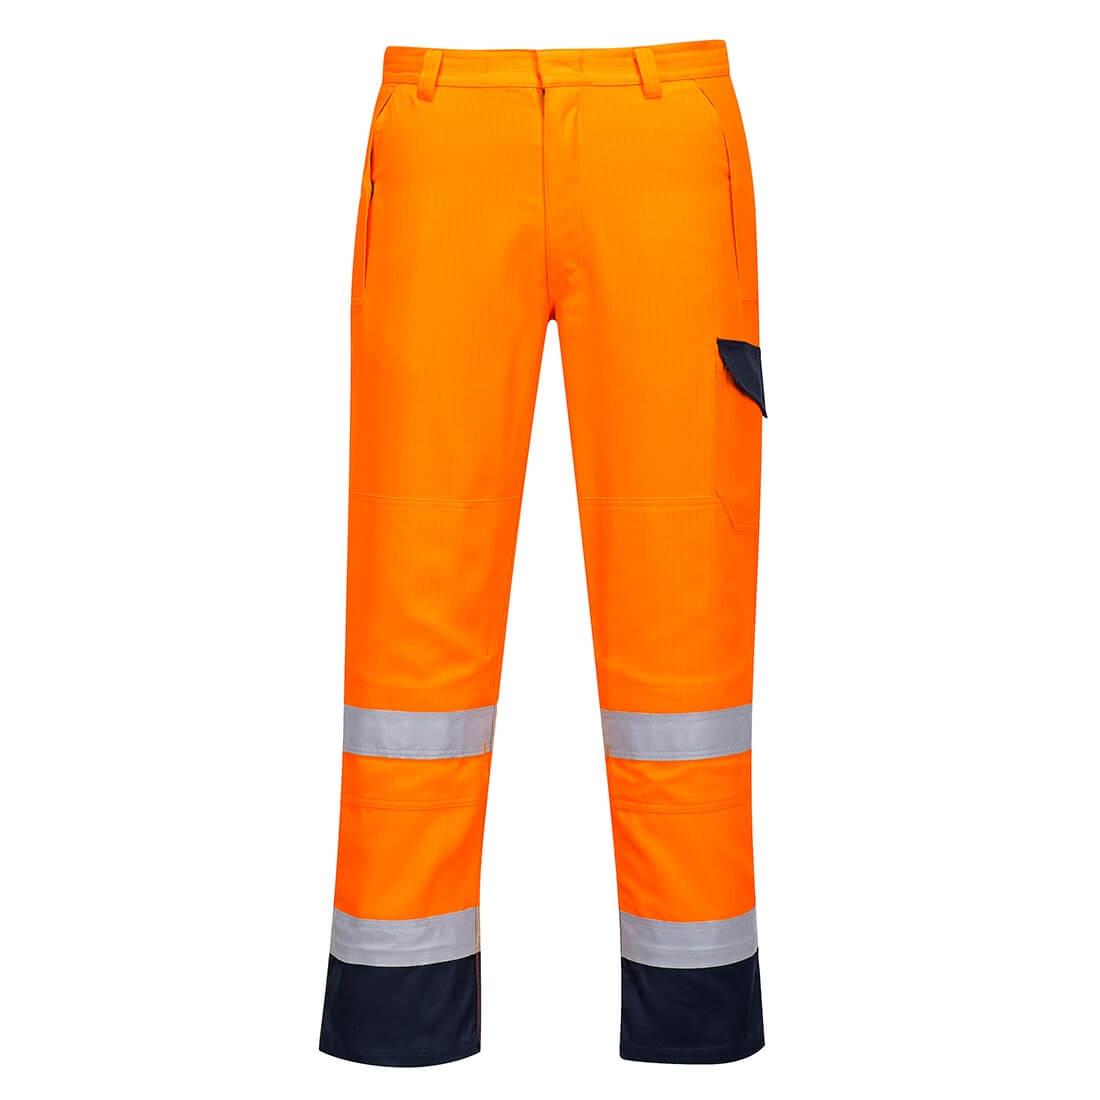 Pantaloni Modaflame RIS Portocaliu/Navy - Imbracaminte de protectie